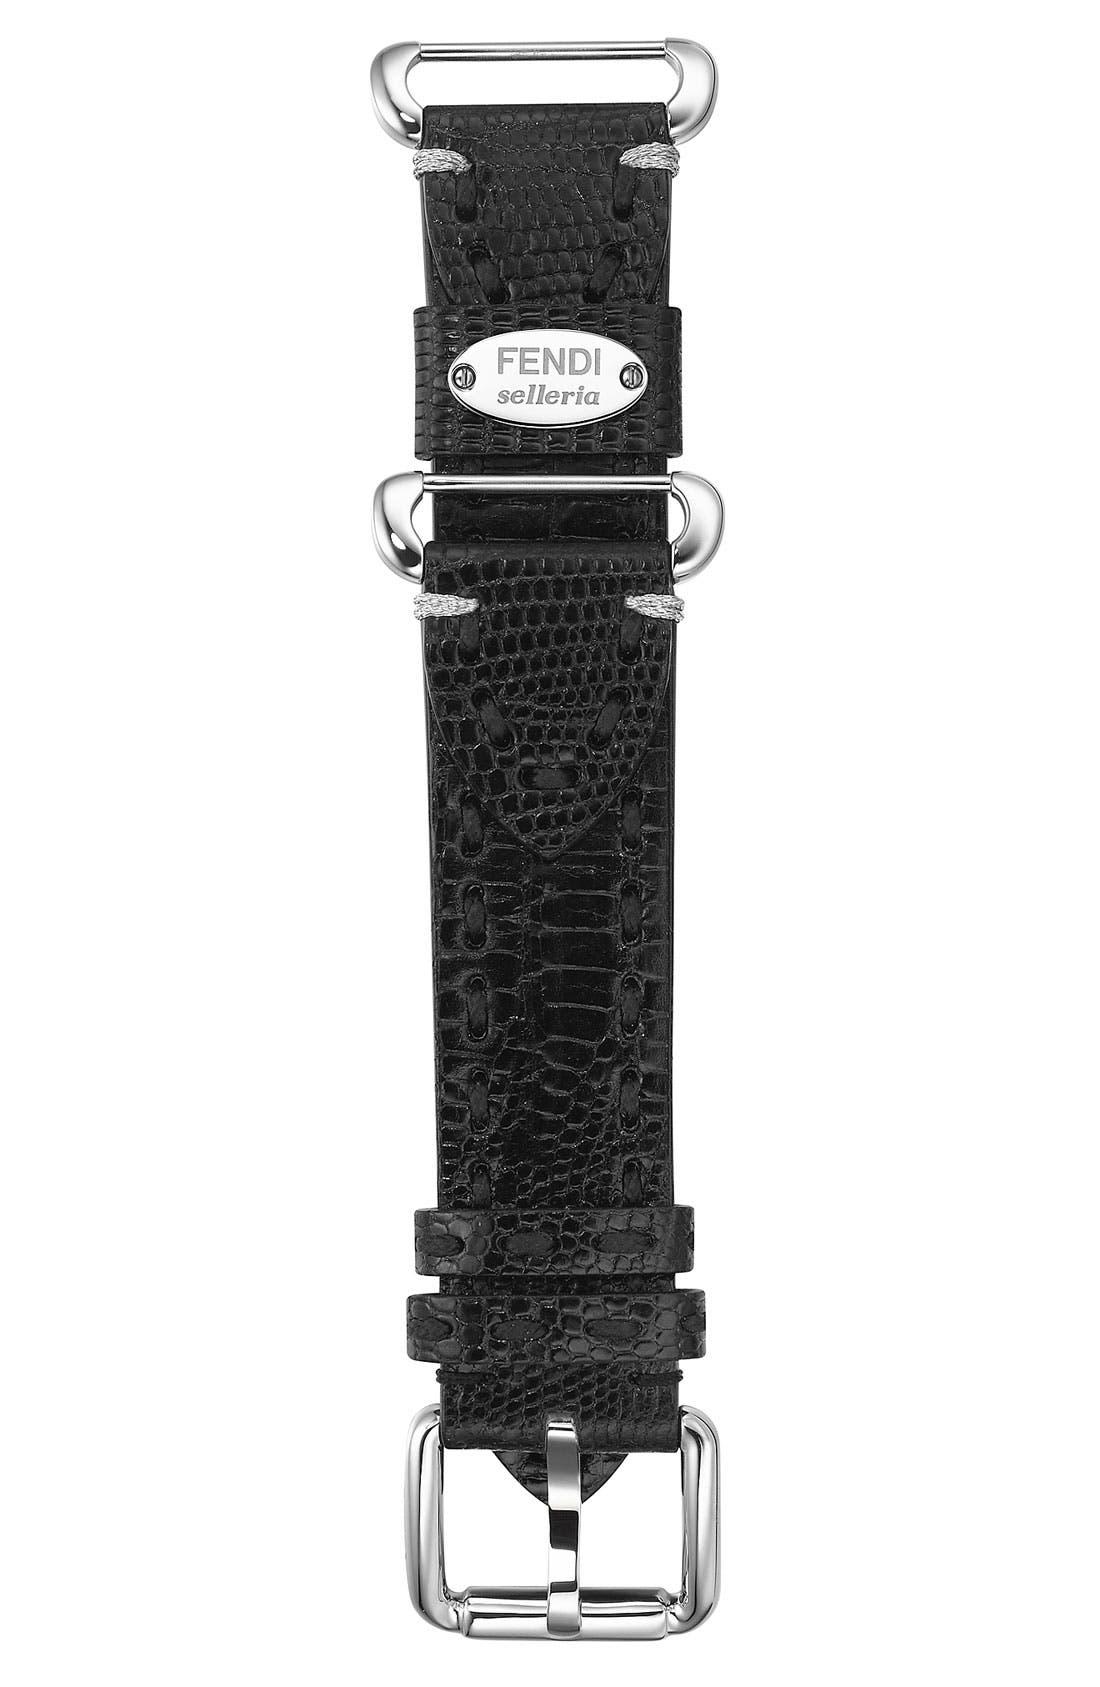 Main Image - Fendi 'Selleria' 18mm Teju Lizardskin Watch Strap